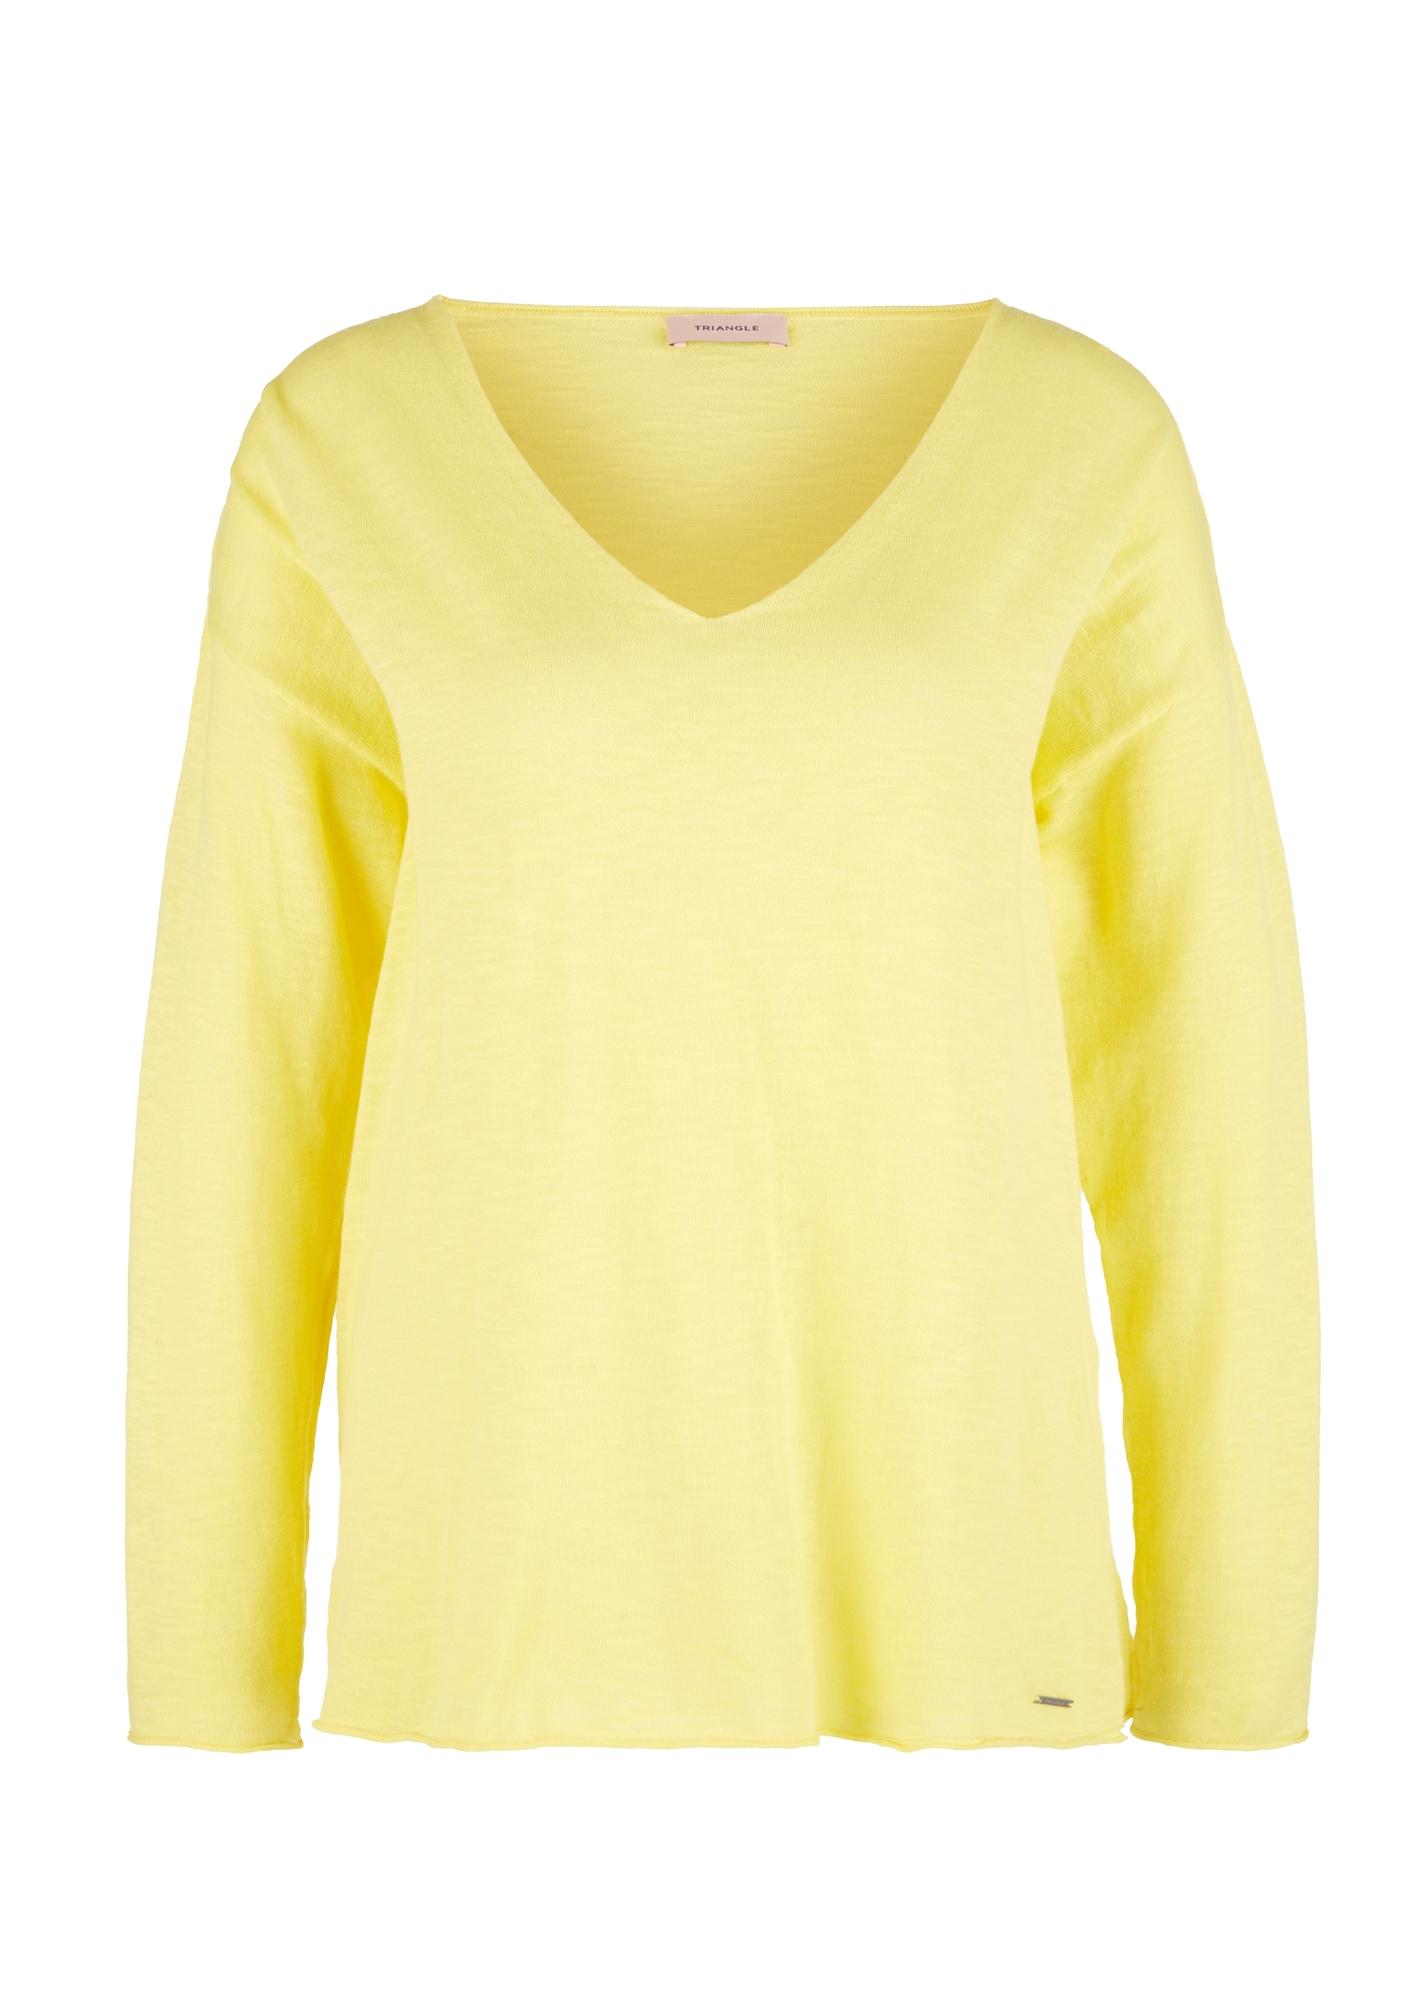 TRIANGLE Megztinis geltona